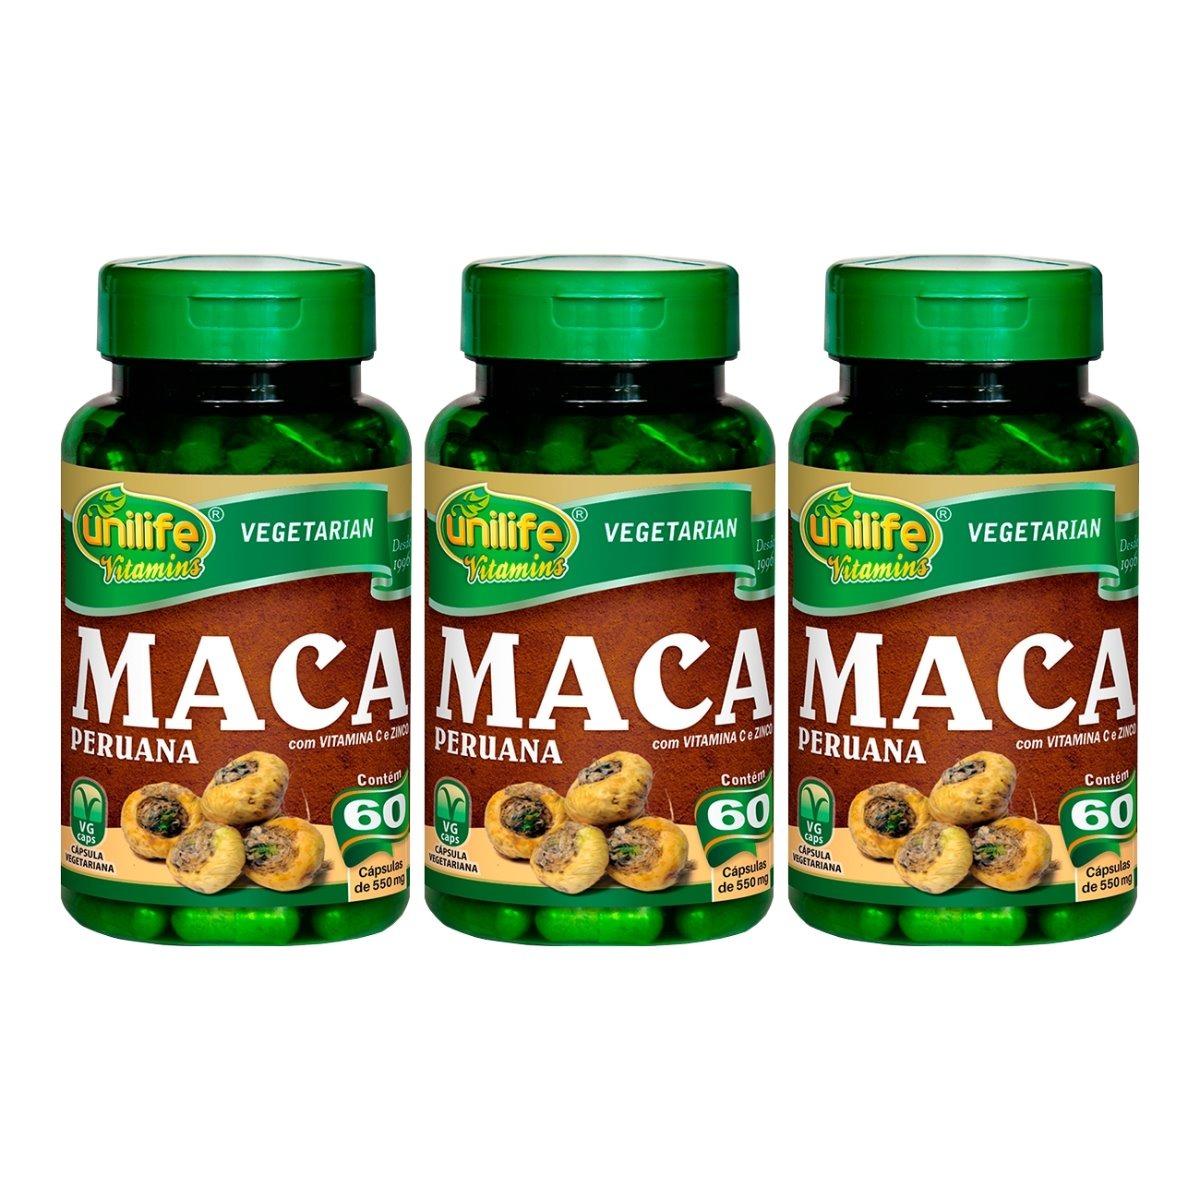 Maca Peruana Com Vitaminas 60 Cápsulas Unilife Kit 3 Unidades